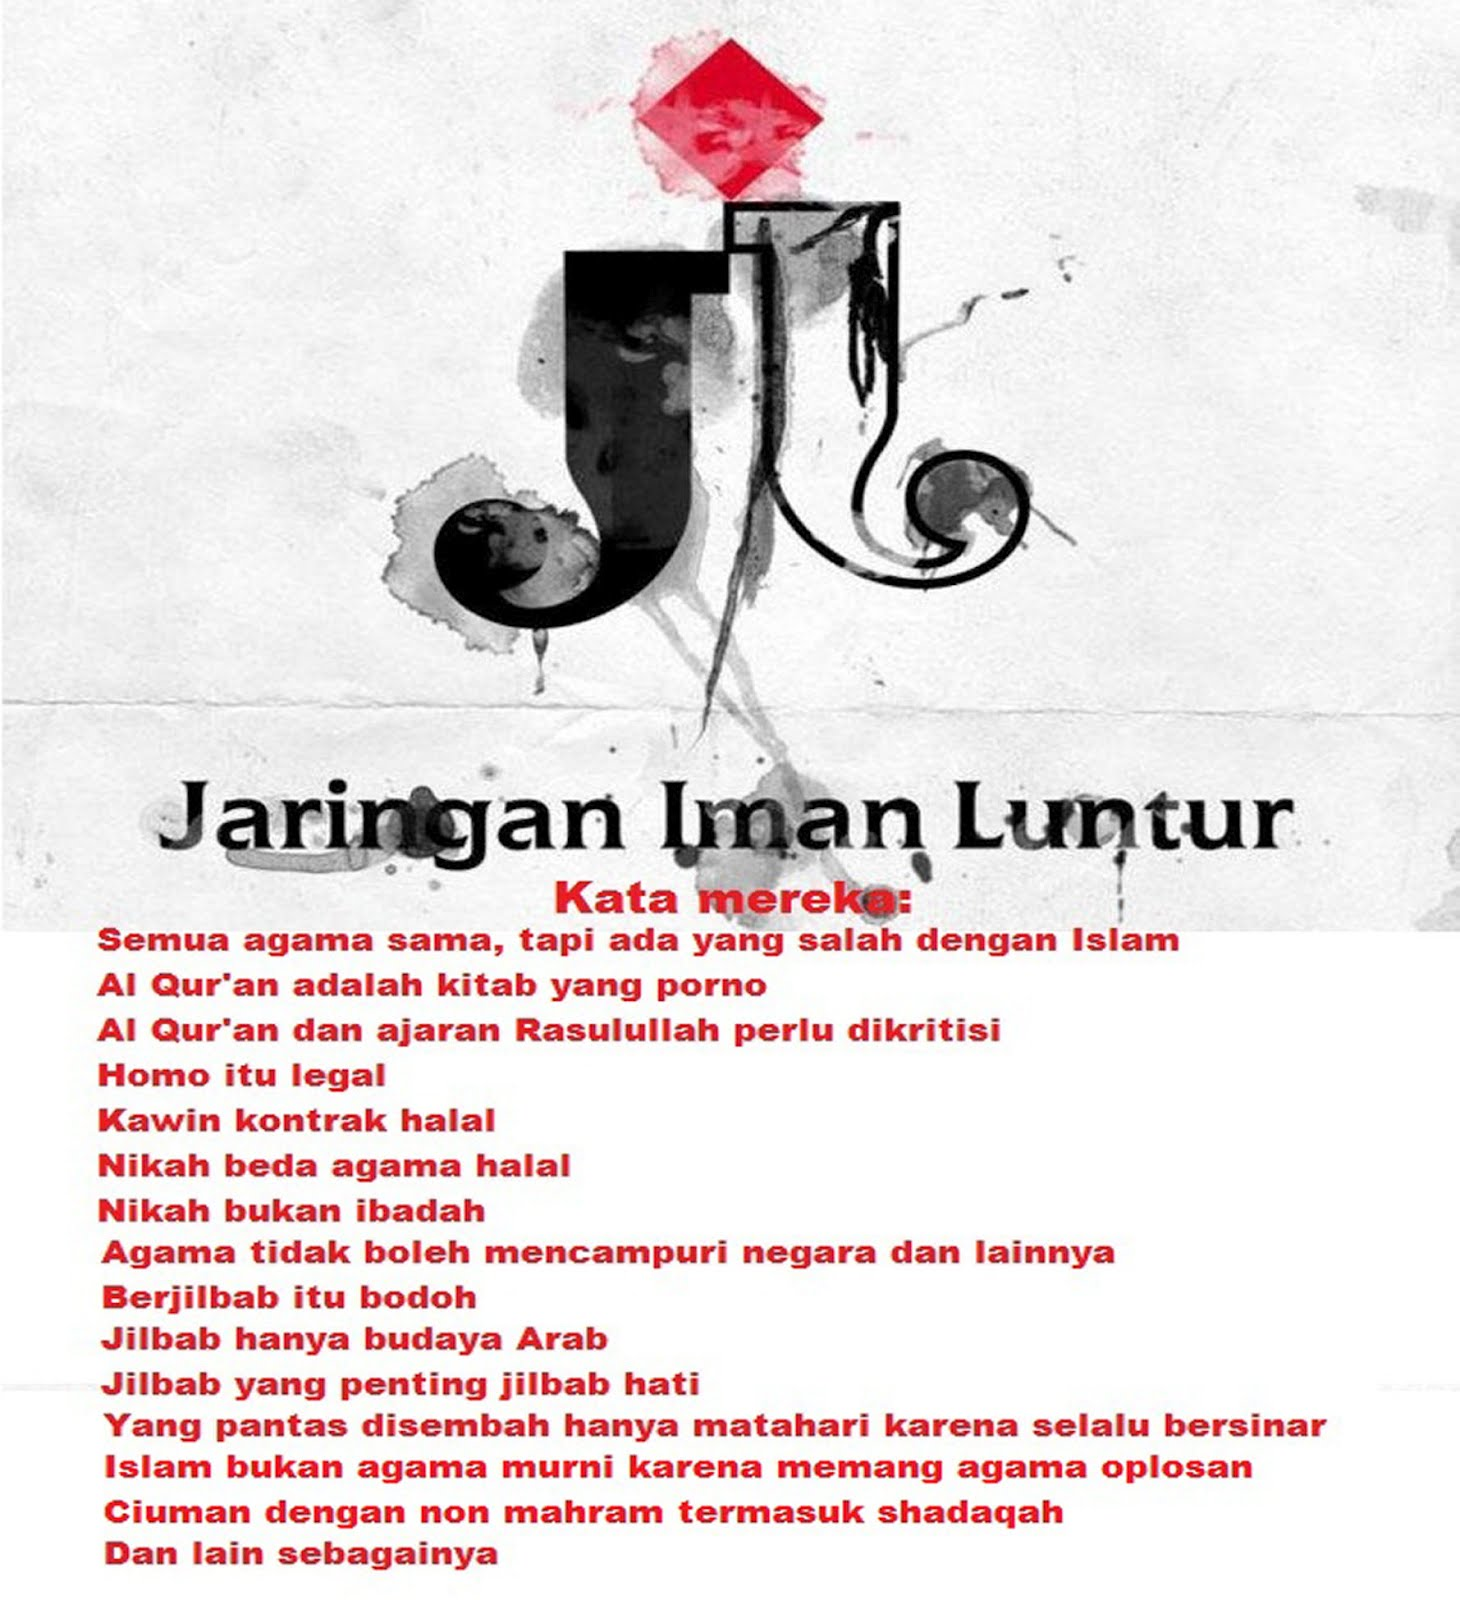 Liberal Kesesatan Atas Nama Agama: SUKSES BERSAMA: INDONESIA TANPA JIL,.... JIL LAGI